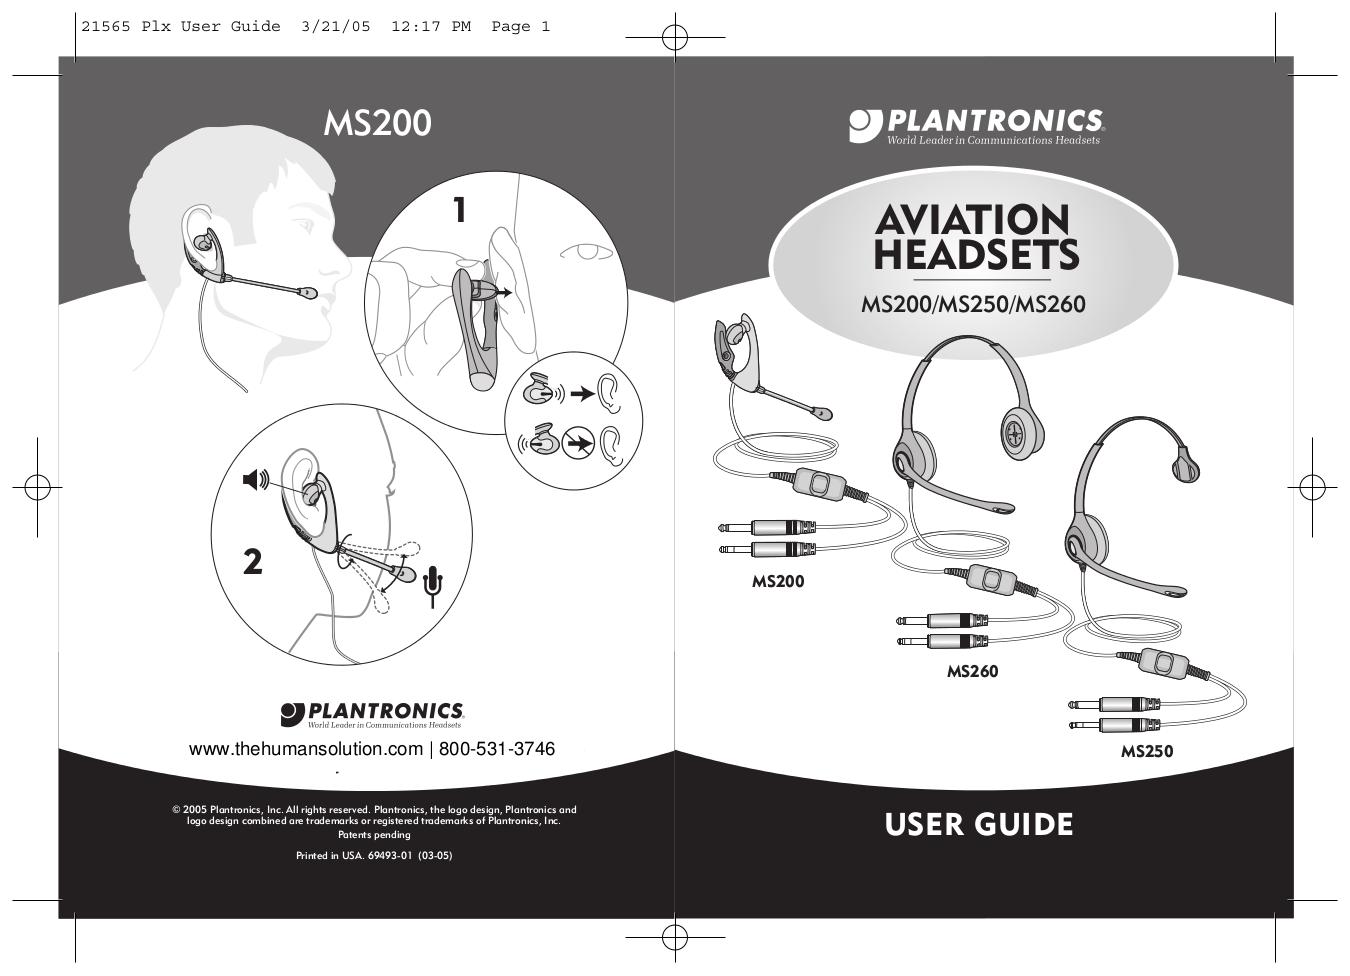 Download free pdf for Plantronics Aviation MS200 Headset manual